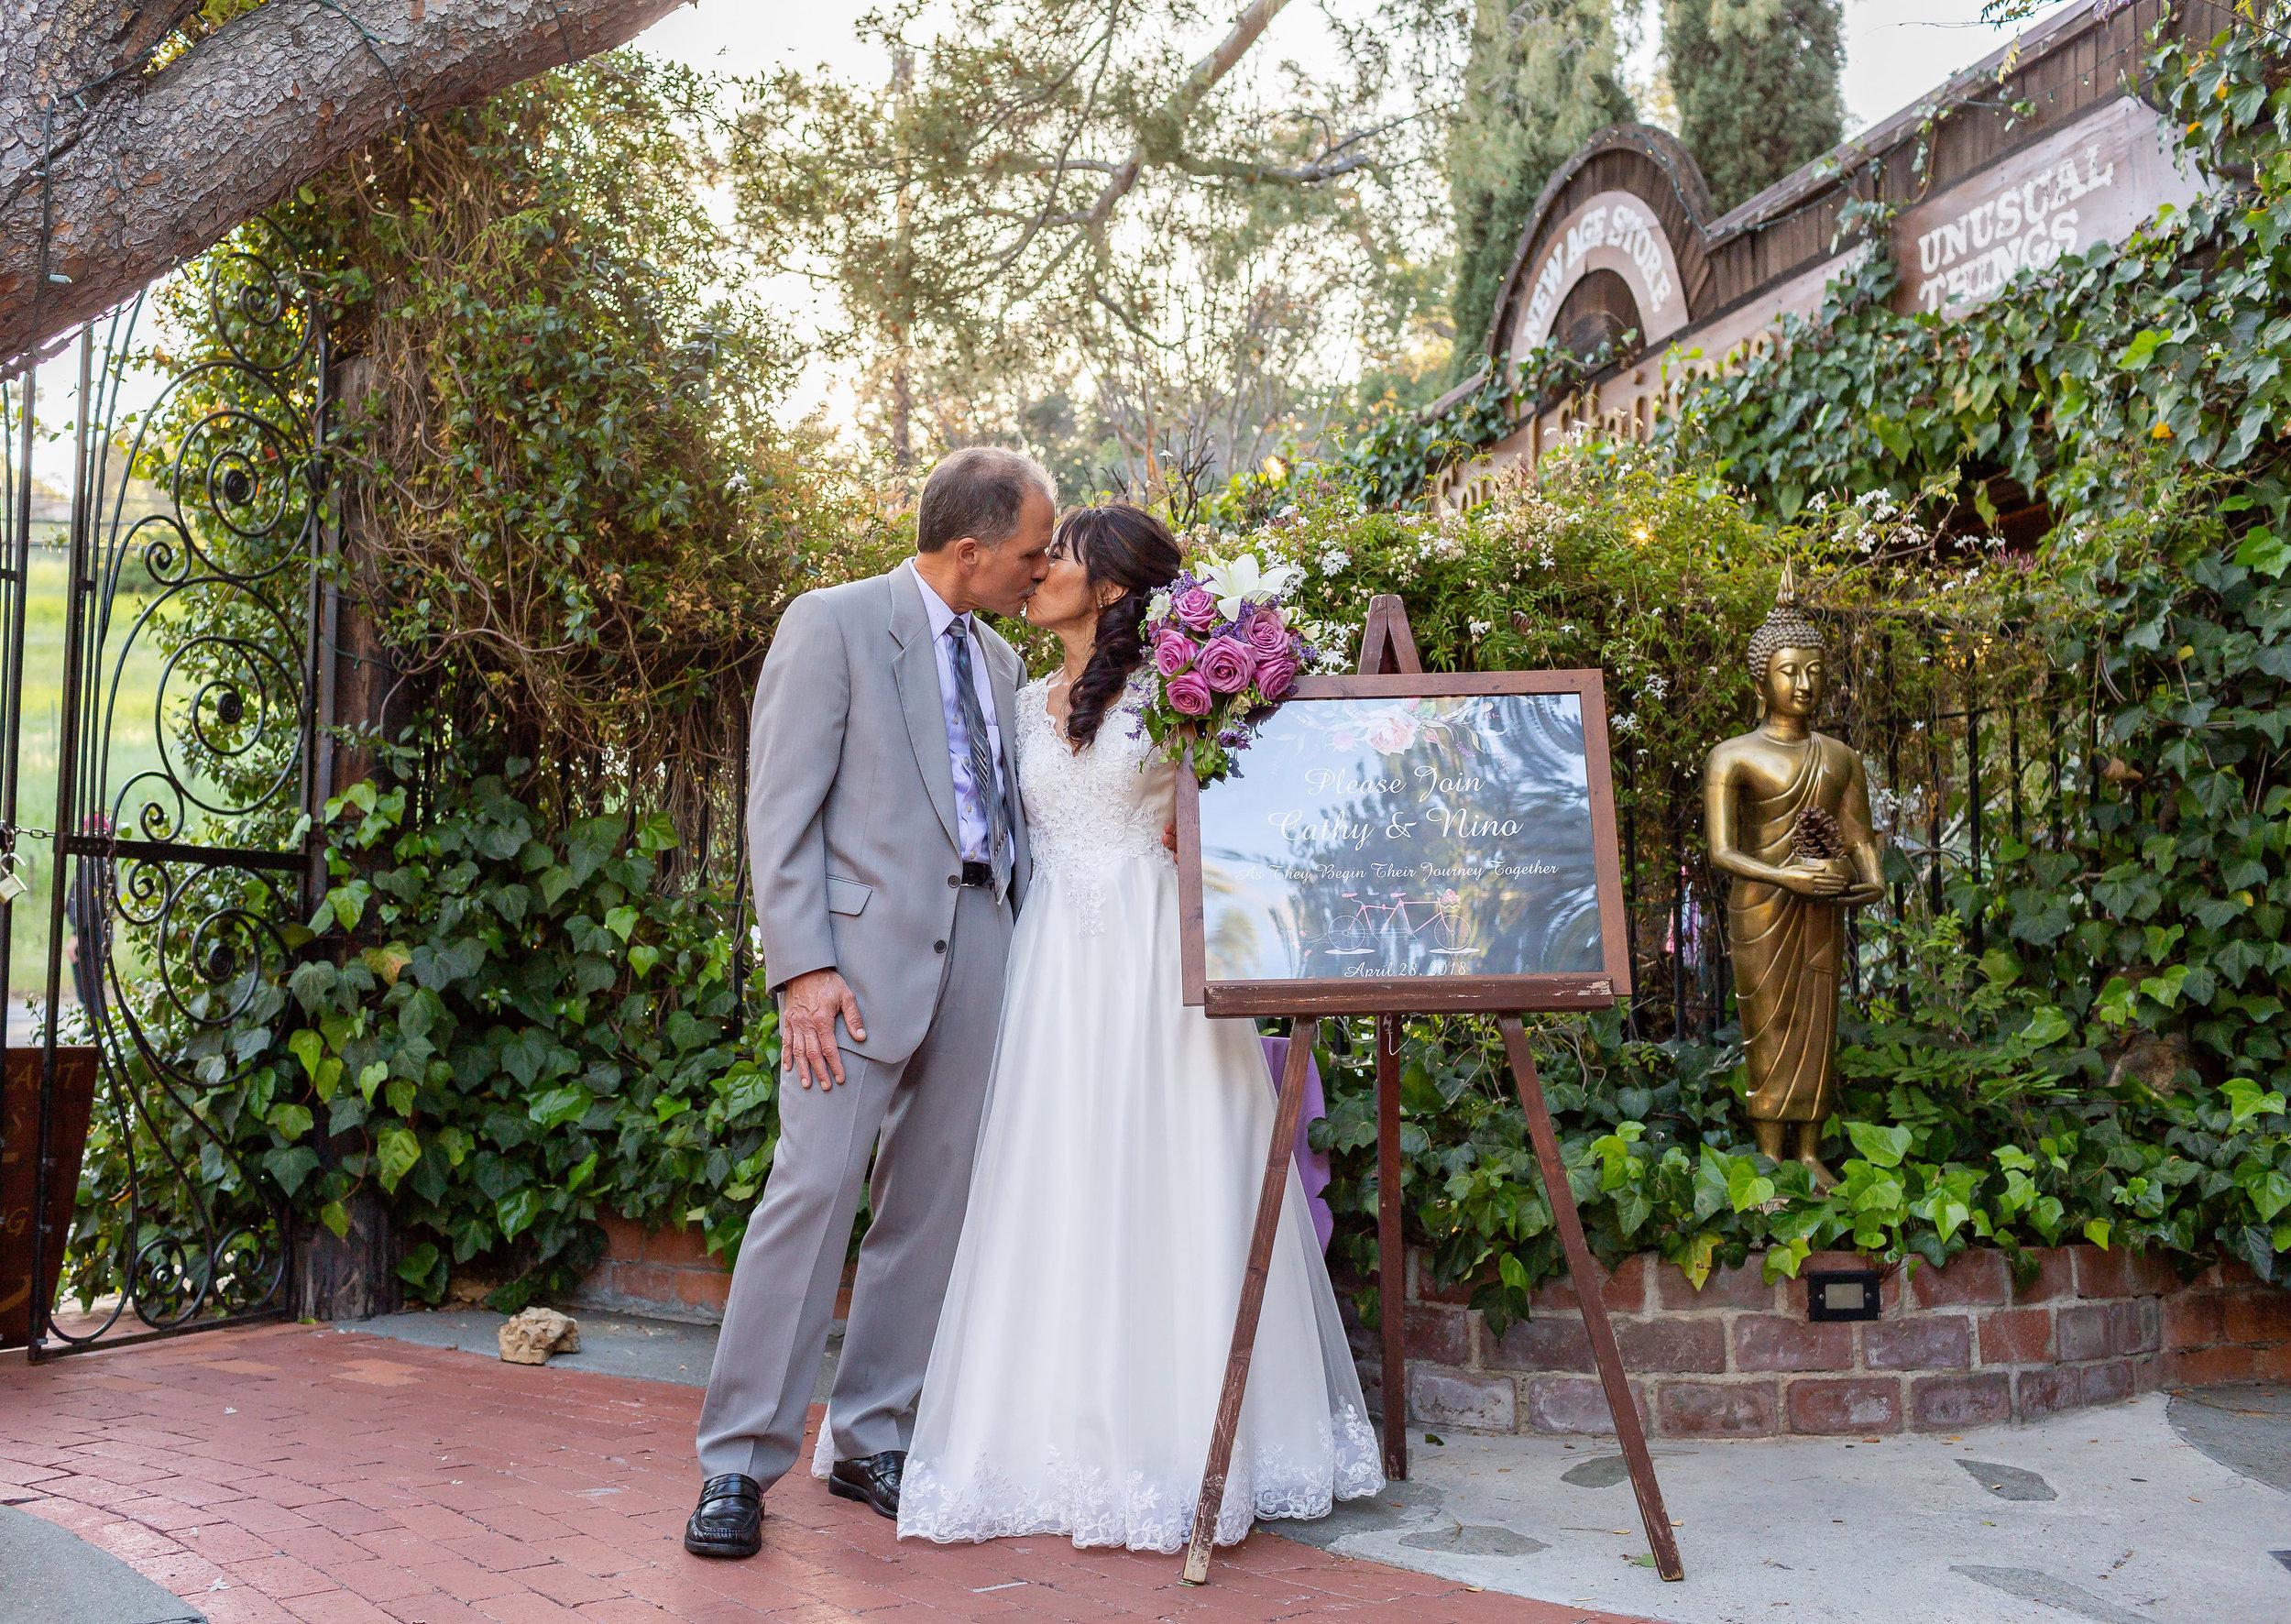 Bride & Groom kissing in front of wedding sign.jpg